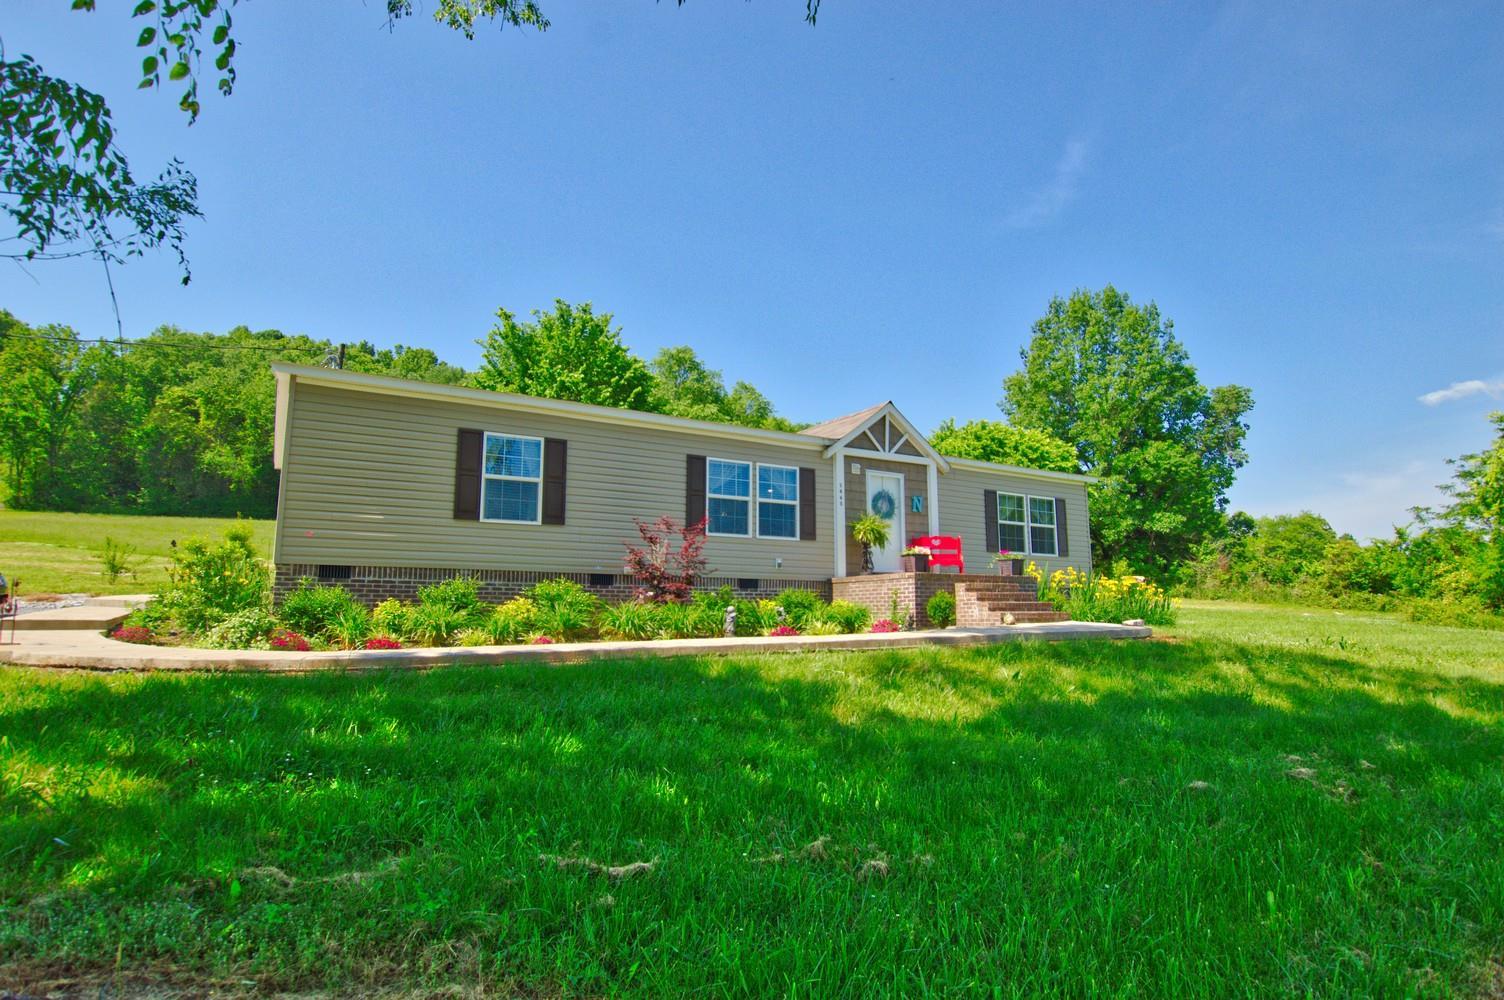 1465 Kennedy Creek Rd, Auburntown, TN 37016 - Auburntown, TN real estate listing